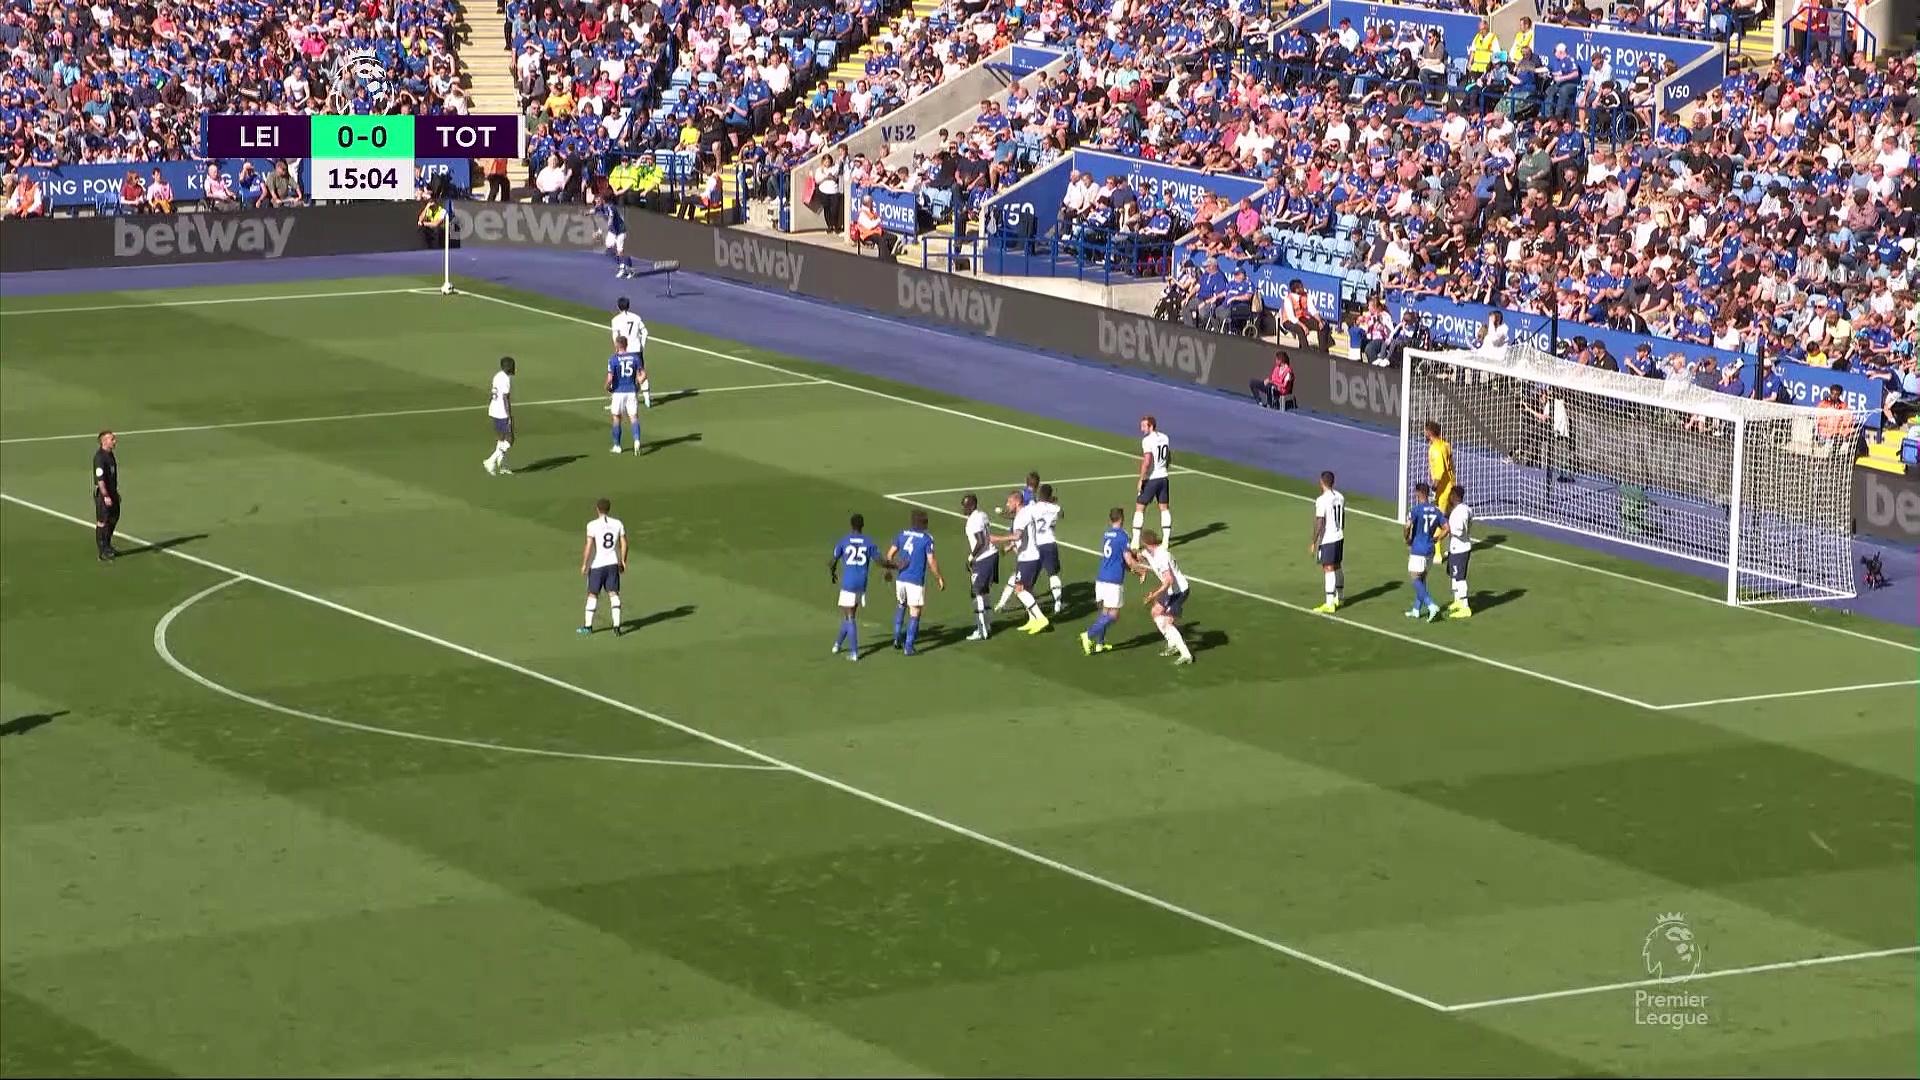 6. Hafta / Leicester City - Tottenham: 2-1 (Özet)